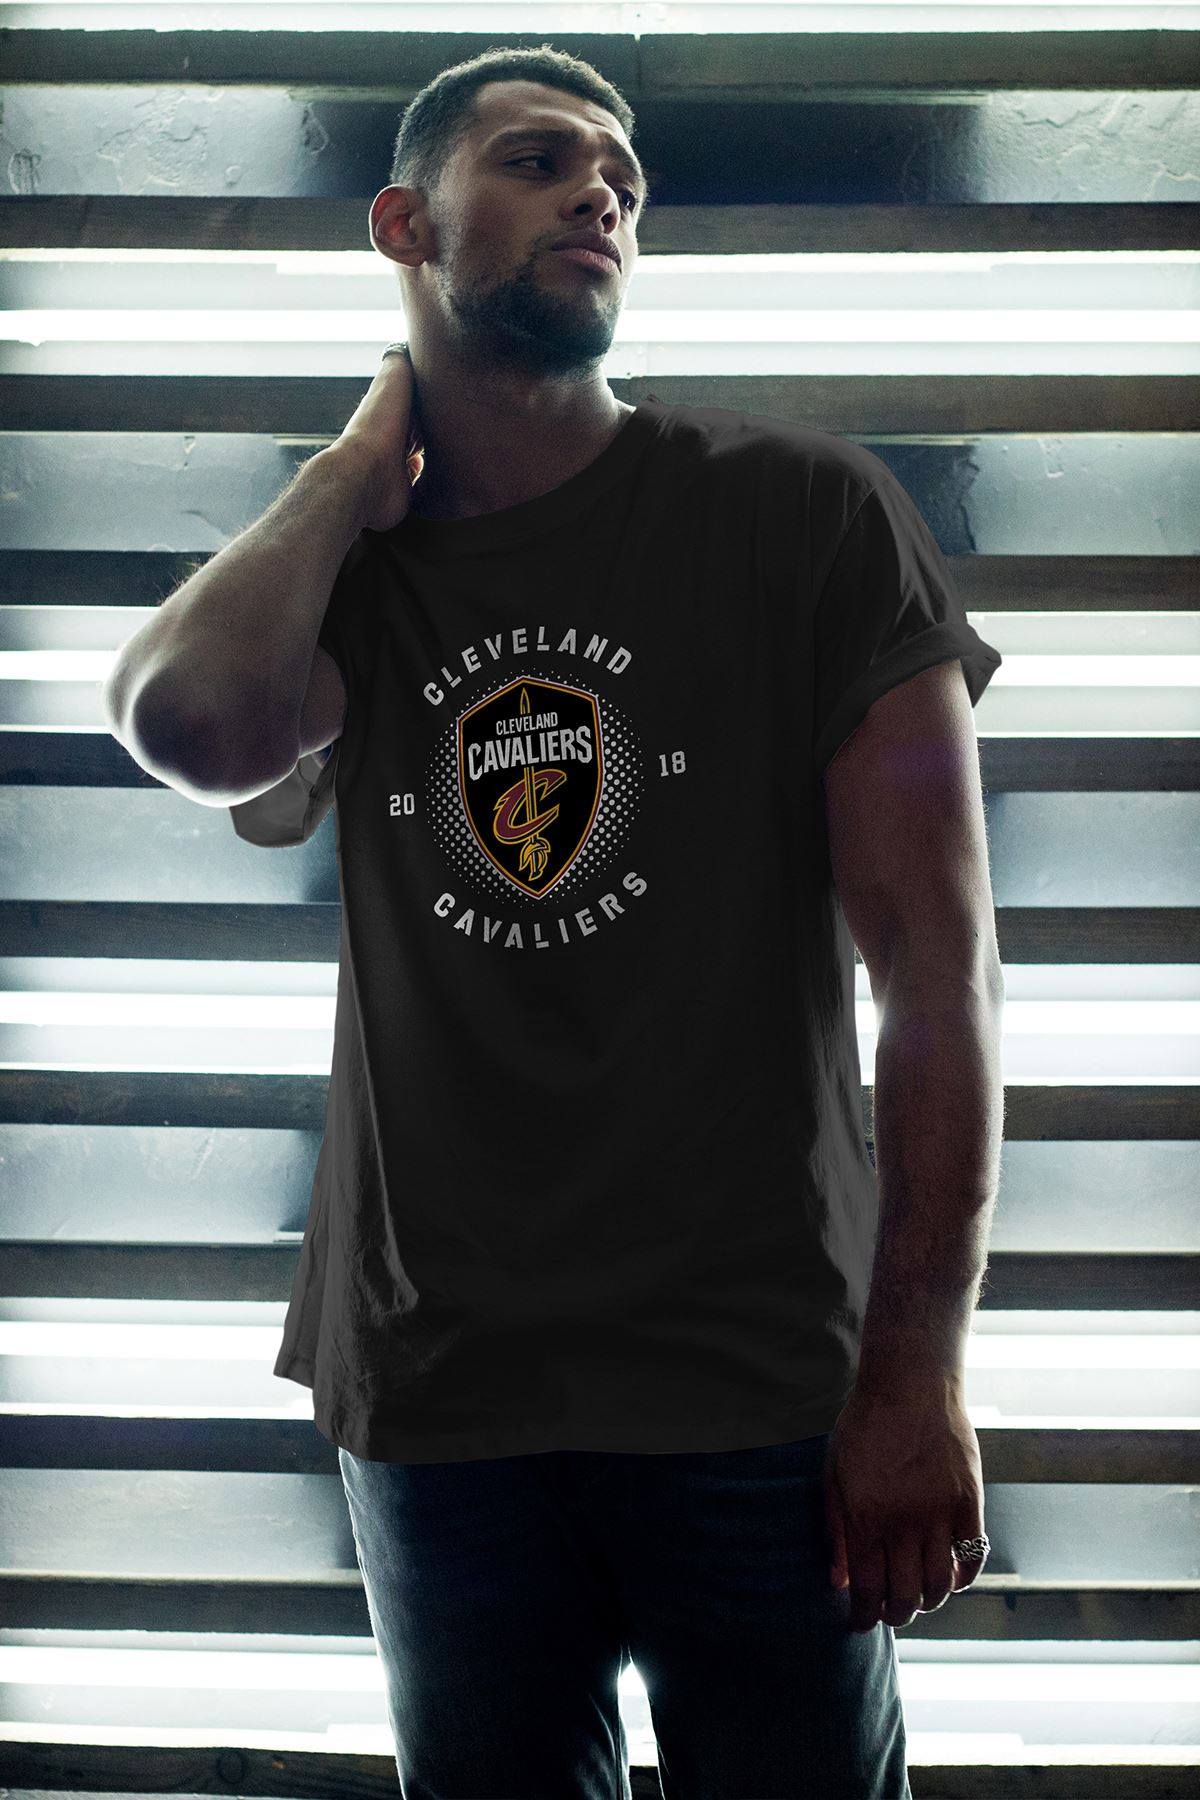 Cleveland 04 Siyah Erkek Oversize Tshirt - Tişört